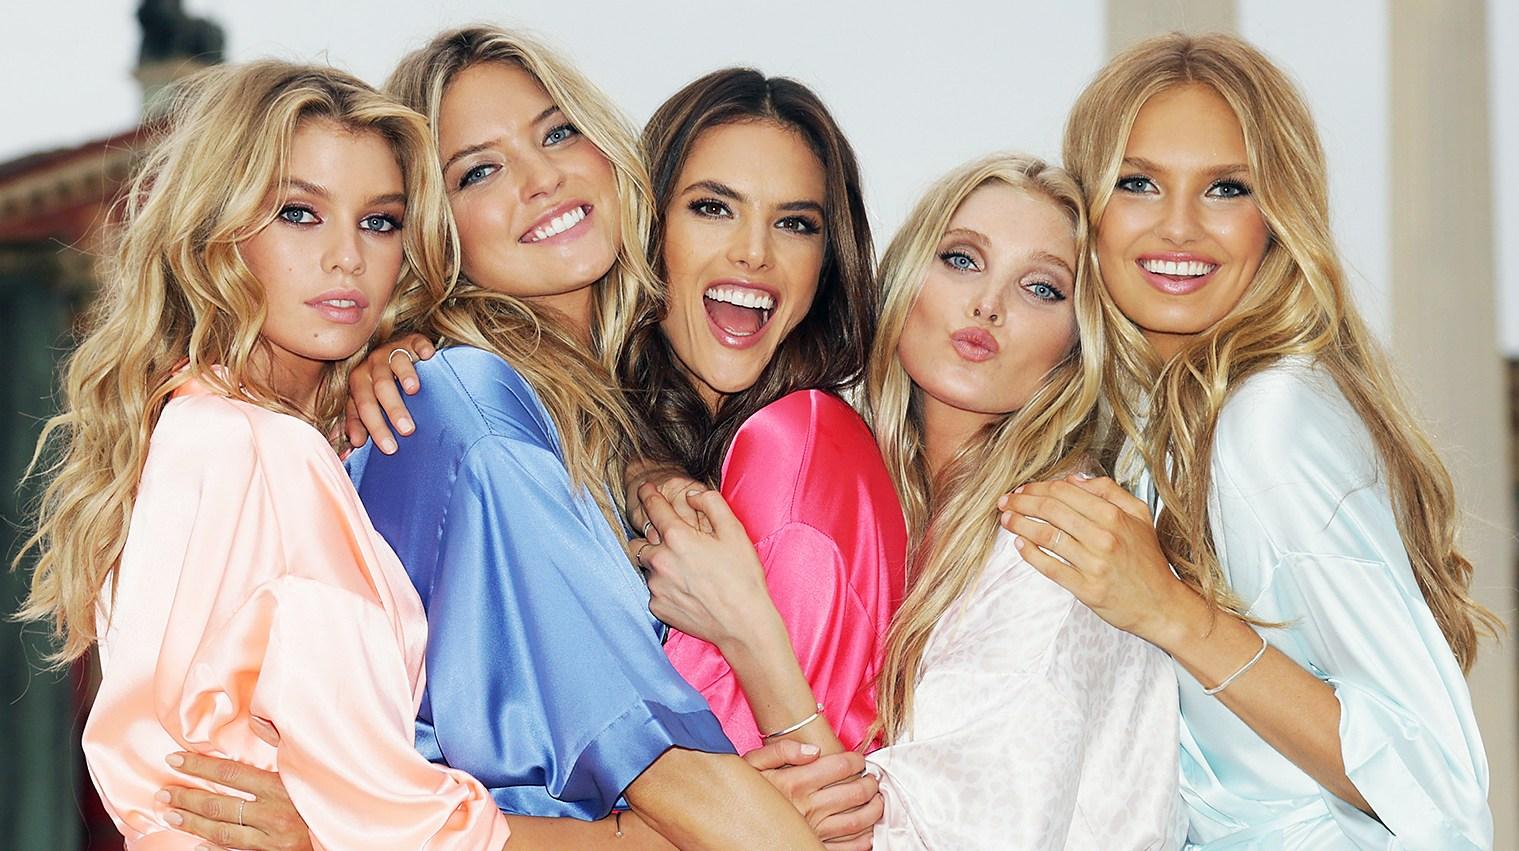 Victoria's Secret Angels Stella Maxwell Martha Hunt Alessandra Ambrosio Elsa Hosk Romee Strijd